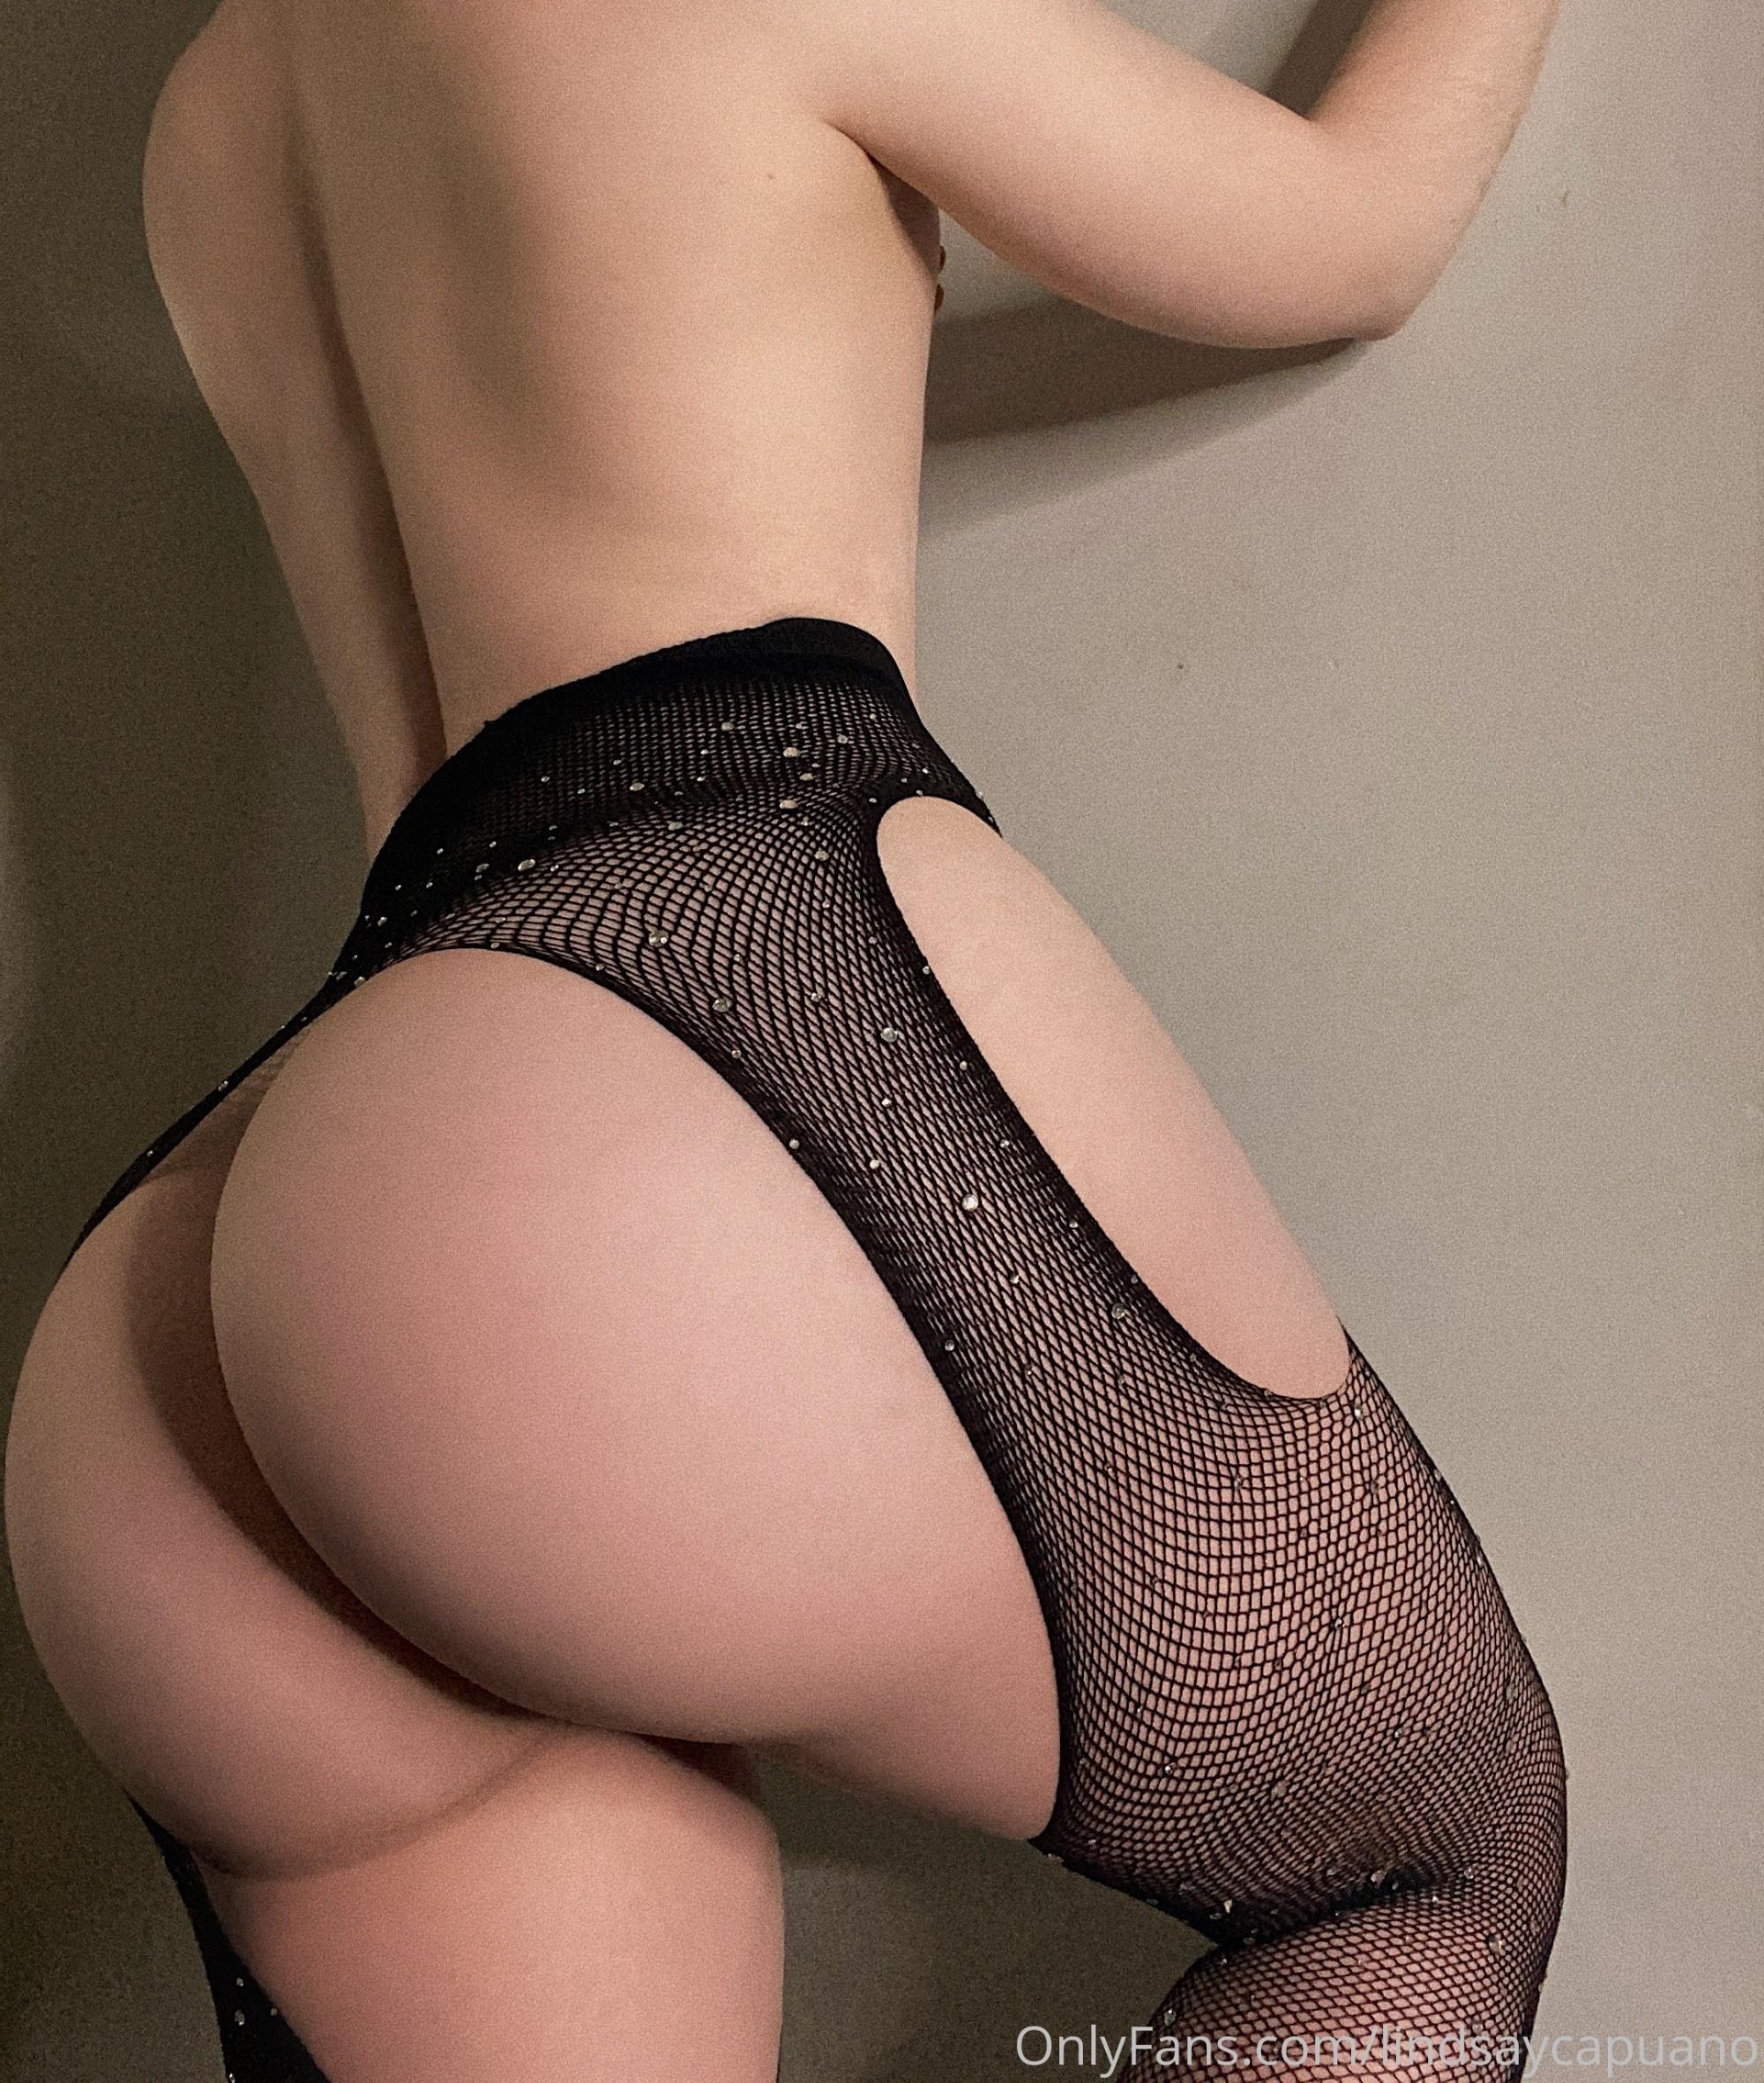 Lindsay Capuano, onlyfans, culonas, fotos gratis chicas onlyfans desnudas